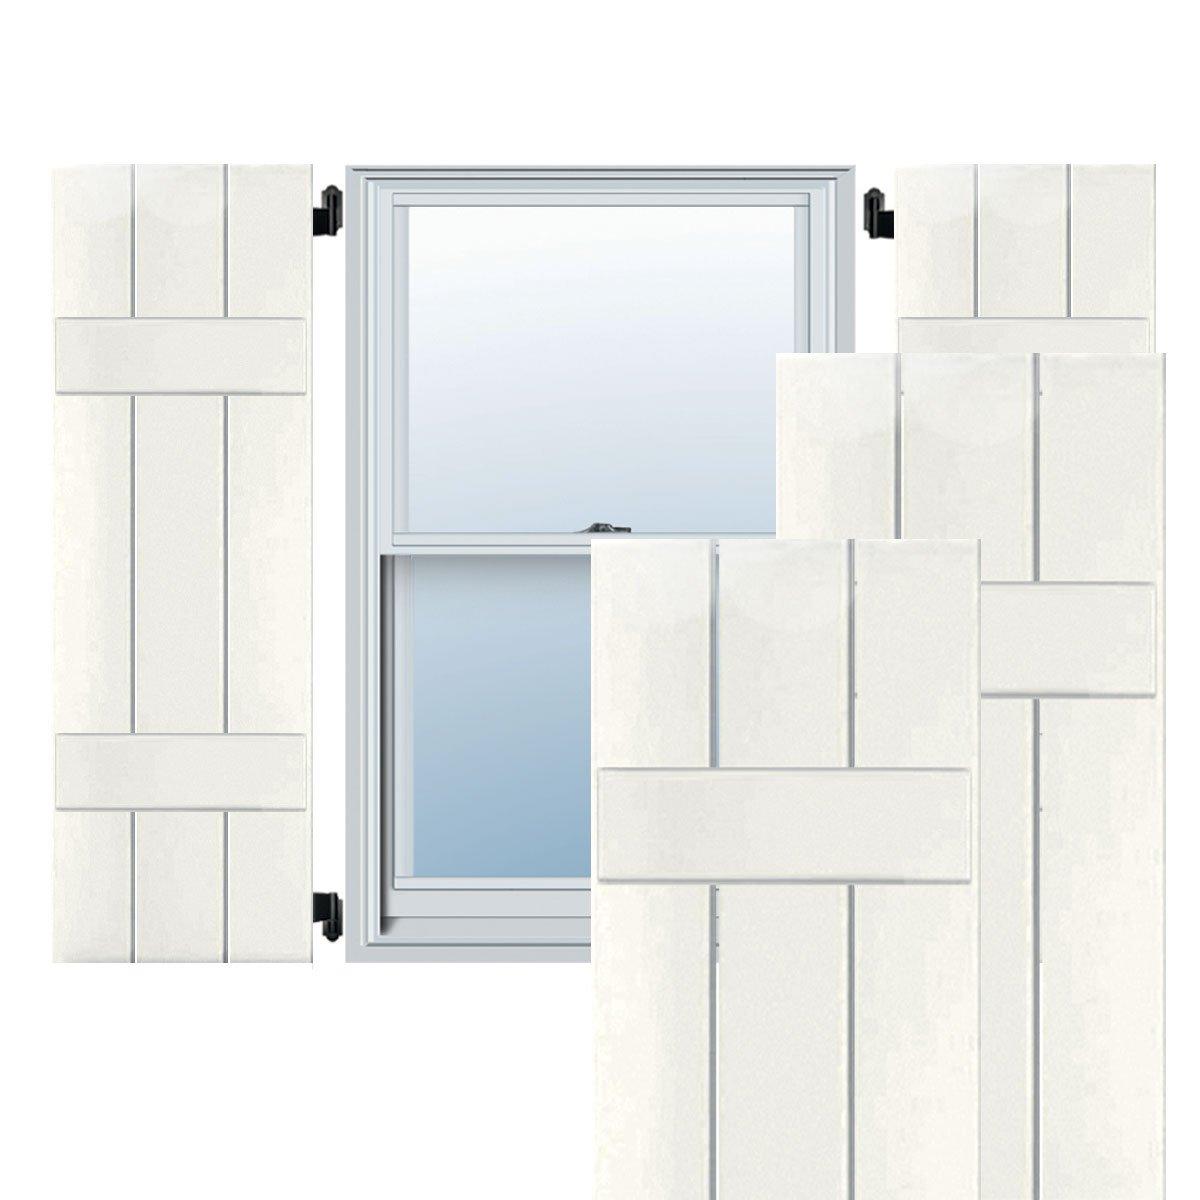 Per Pair Ekena Millwork EB0110500X033000WWH Exterior Western Red Cedar Three Board Two Batten Board-n-Batten Shutters White 10 1//2W x 33H 10 1//2W x 33H